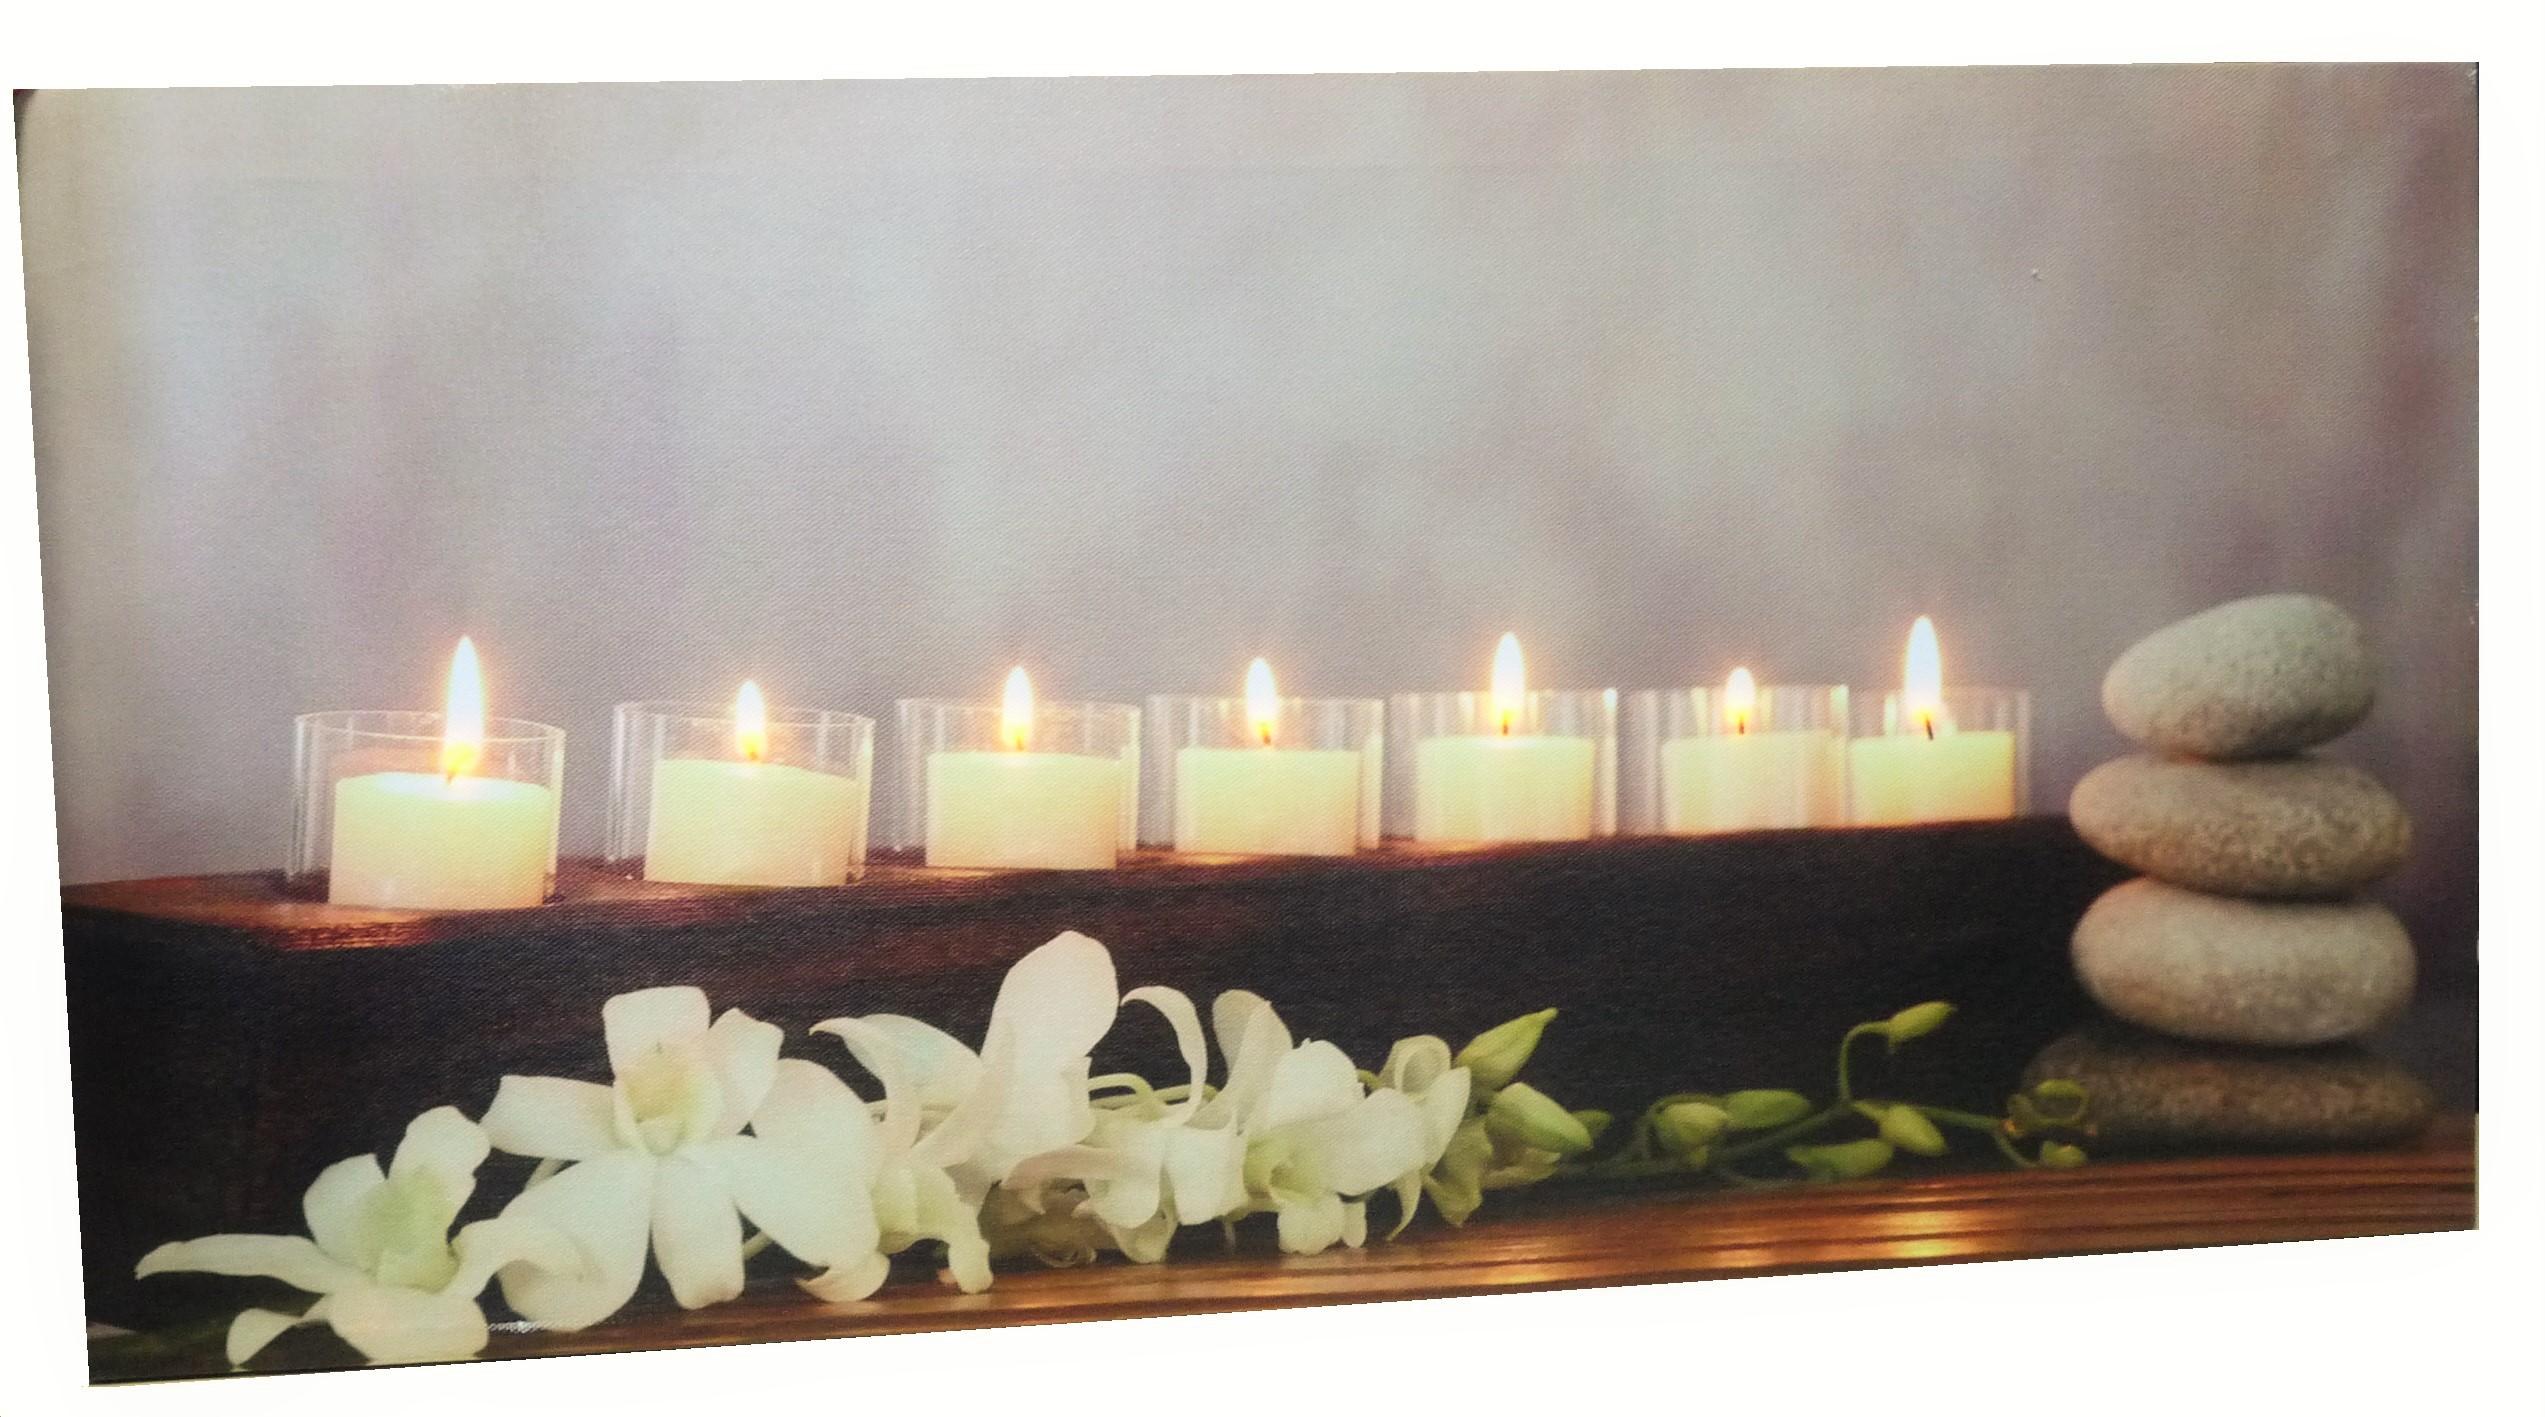 led beleuchtetes wandbild gro es bild mit 7 kerzen 60 cm x 30 cm feng shui ebay. Black Bedroom Furniture Sets. Home Design Ideas